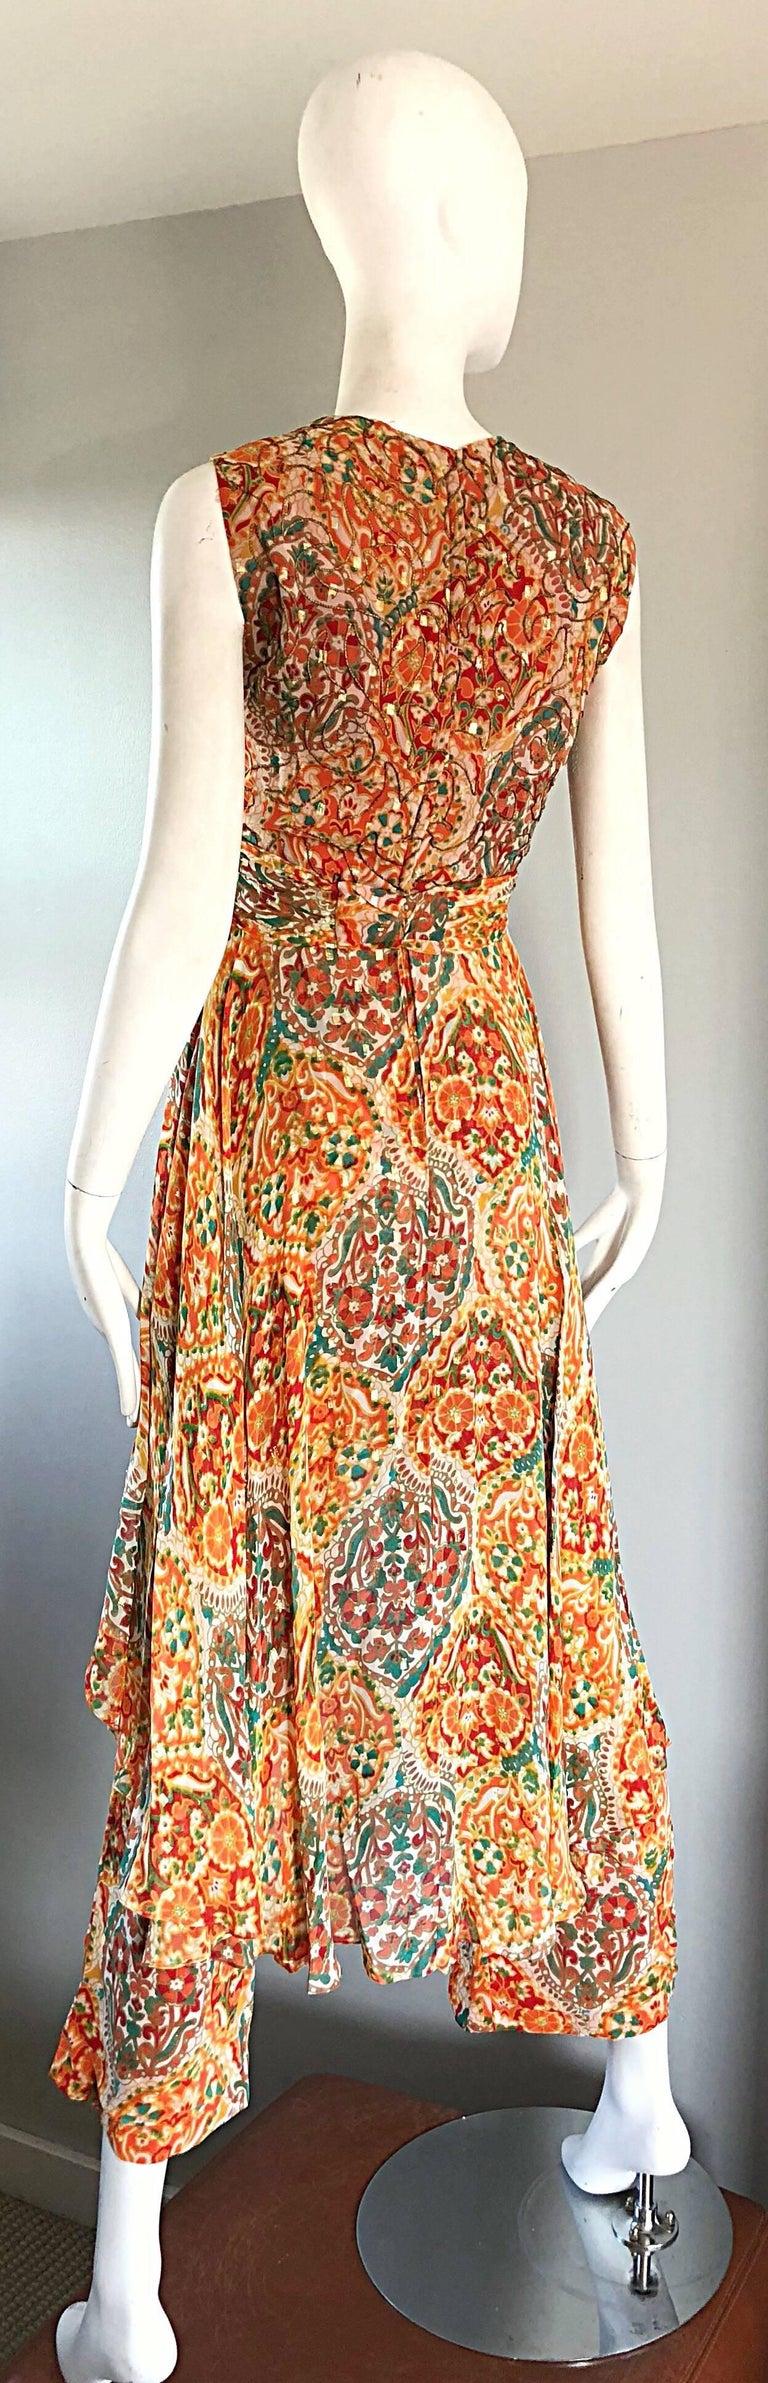 Oscar de la Renta Silk Boho Batik Print Vintage Jumpsuit with Attached Skirt  For Sale 3